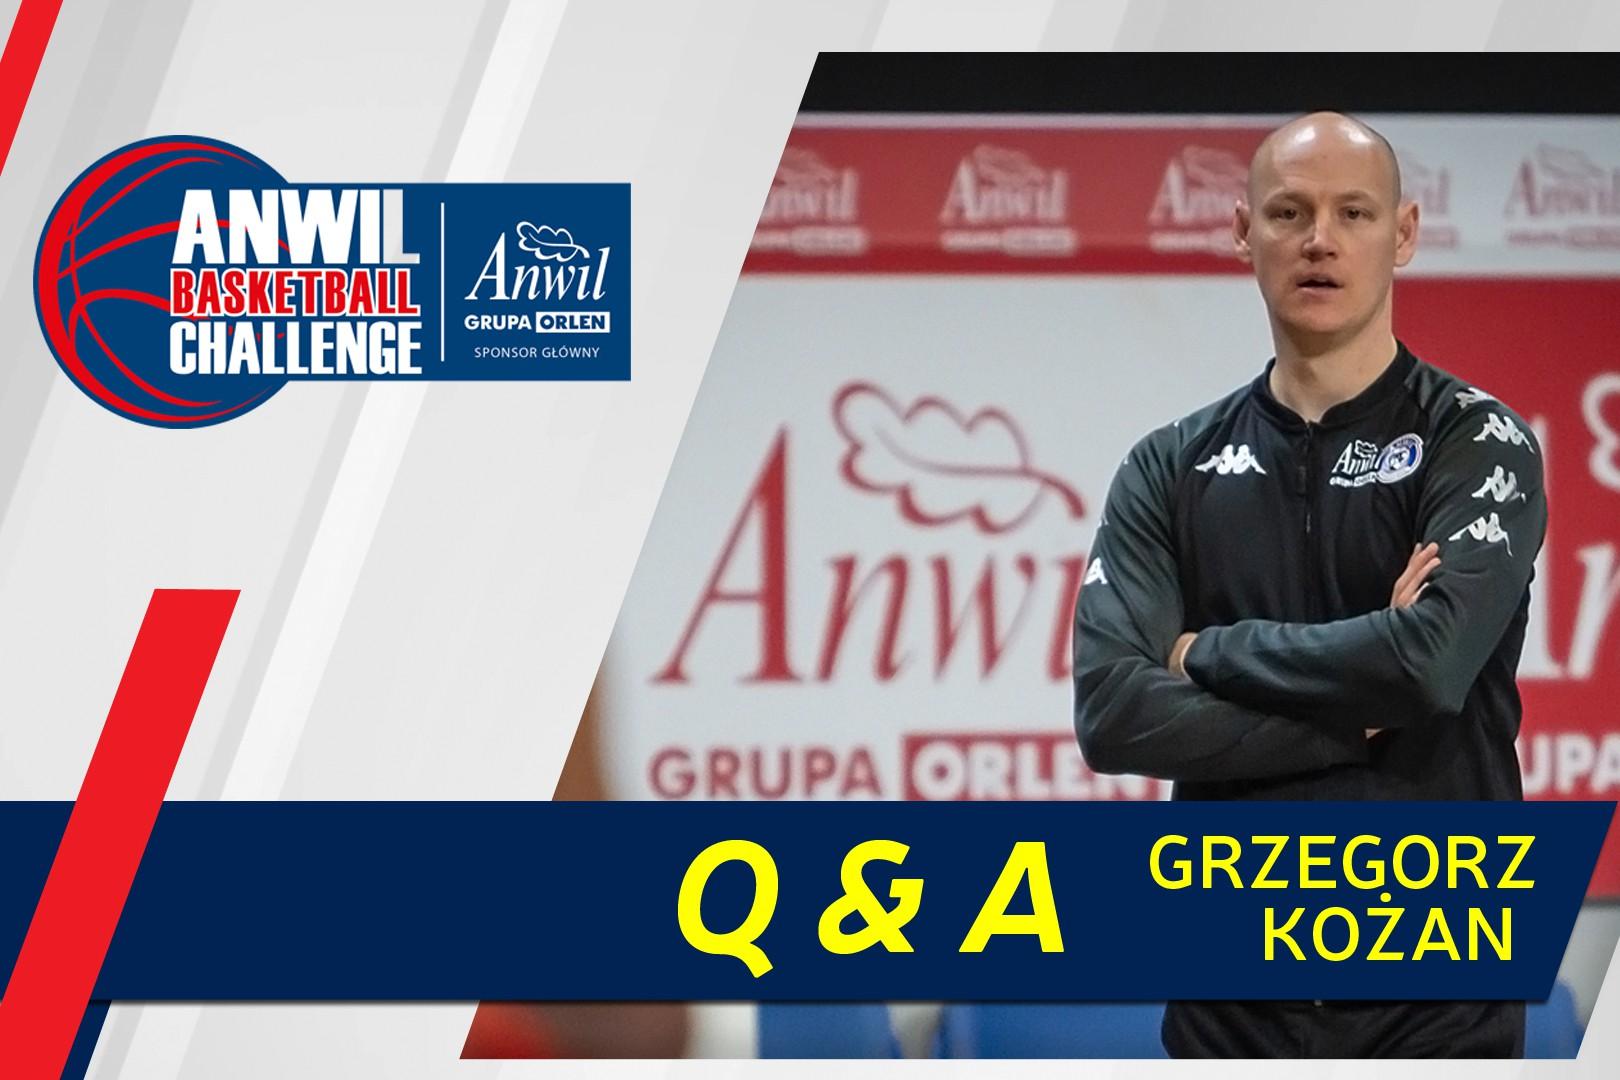 Q & A | Grzegorz Kożan | ANWIL Basketball Challenge